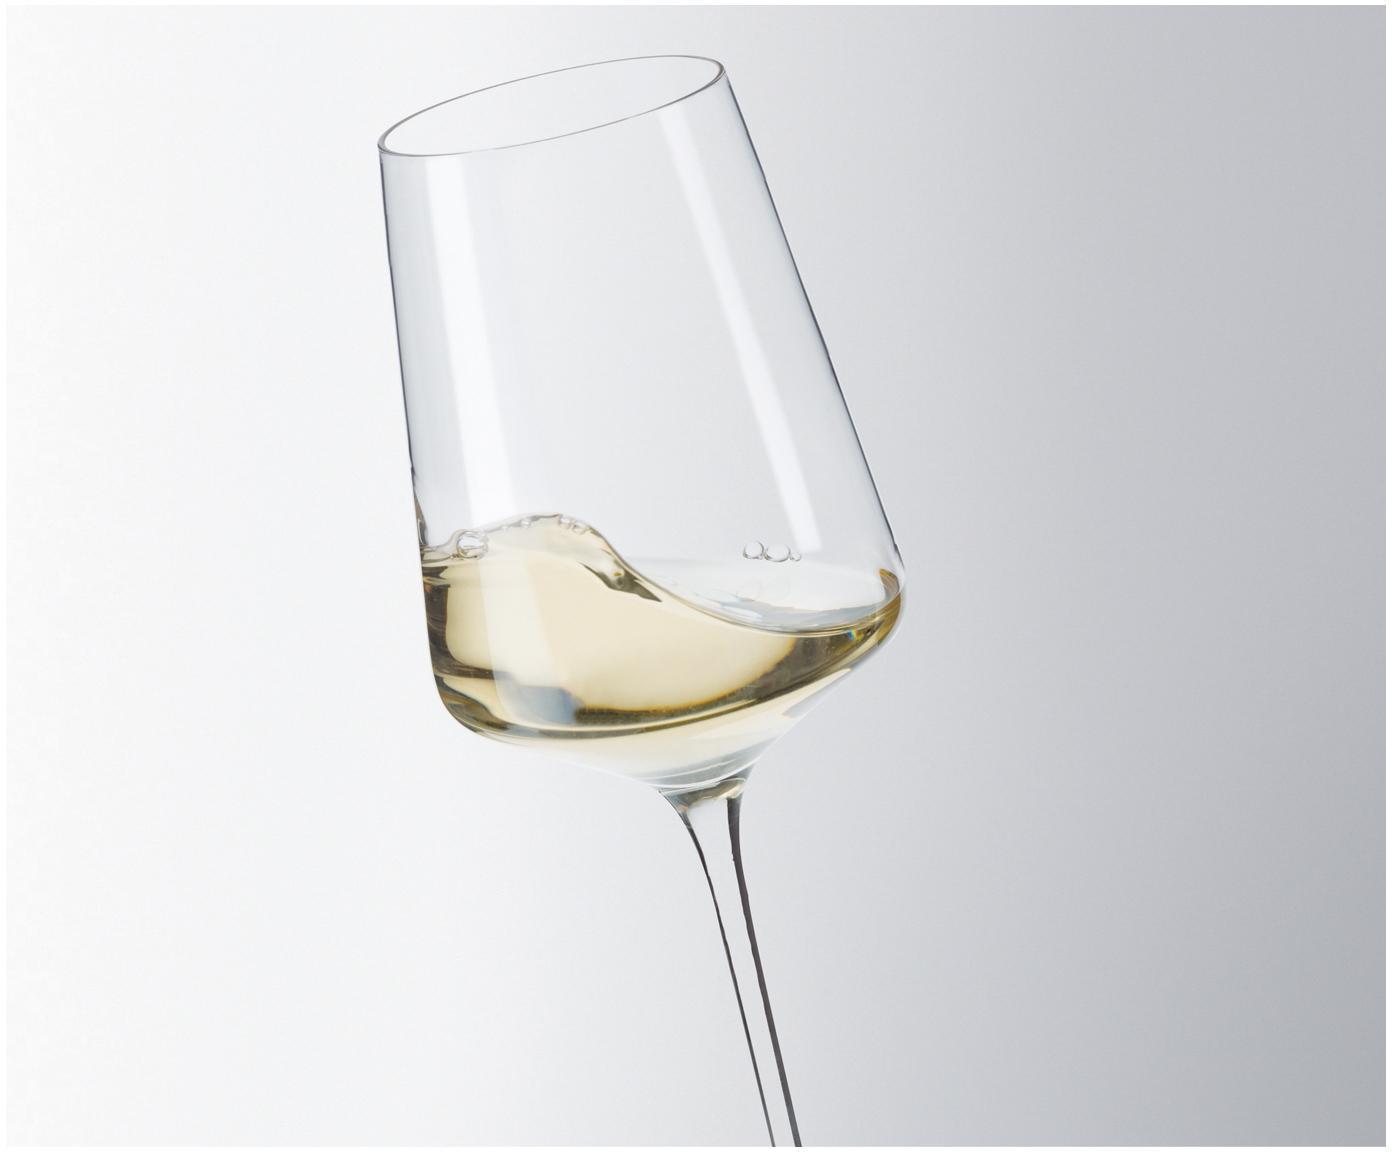 Witte wijnglazen Puccini, 6 stuks, Teqton®-glas, Transparant, 560 ml